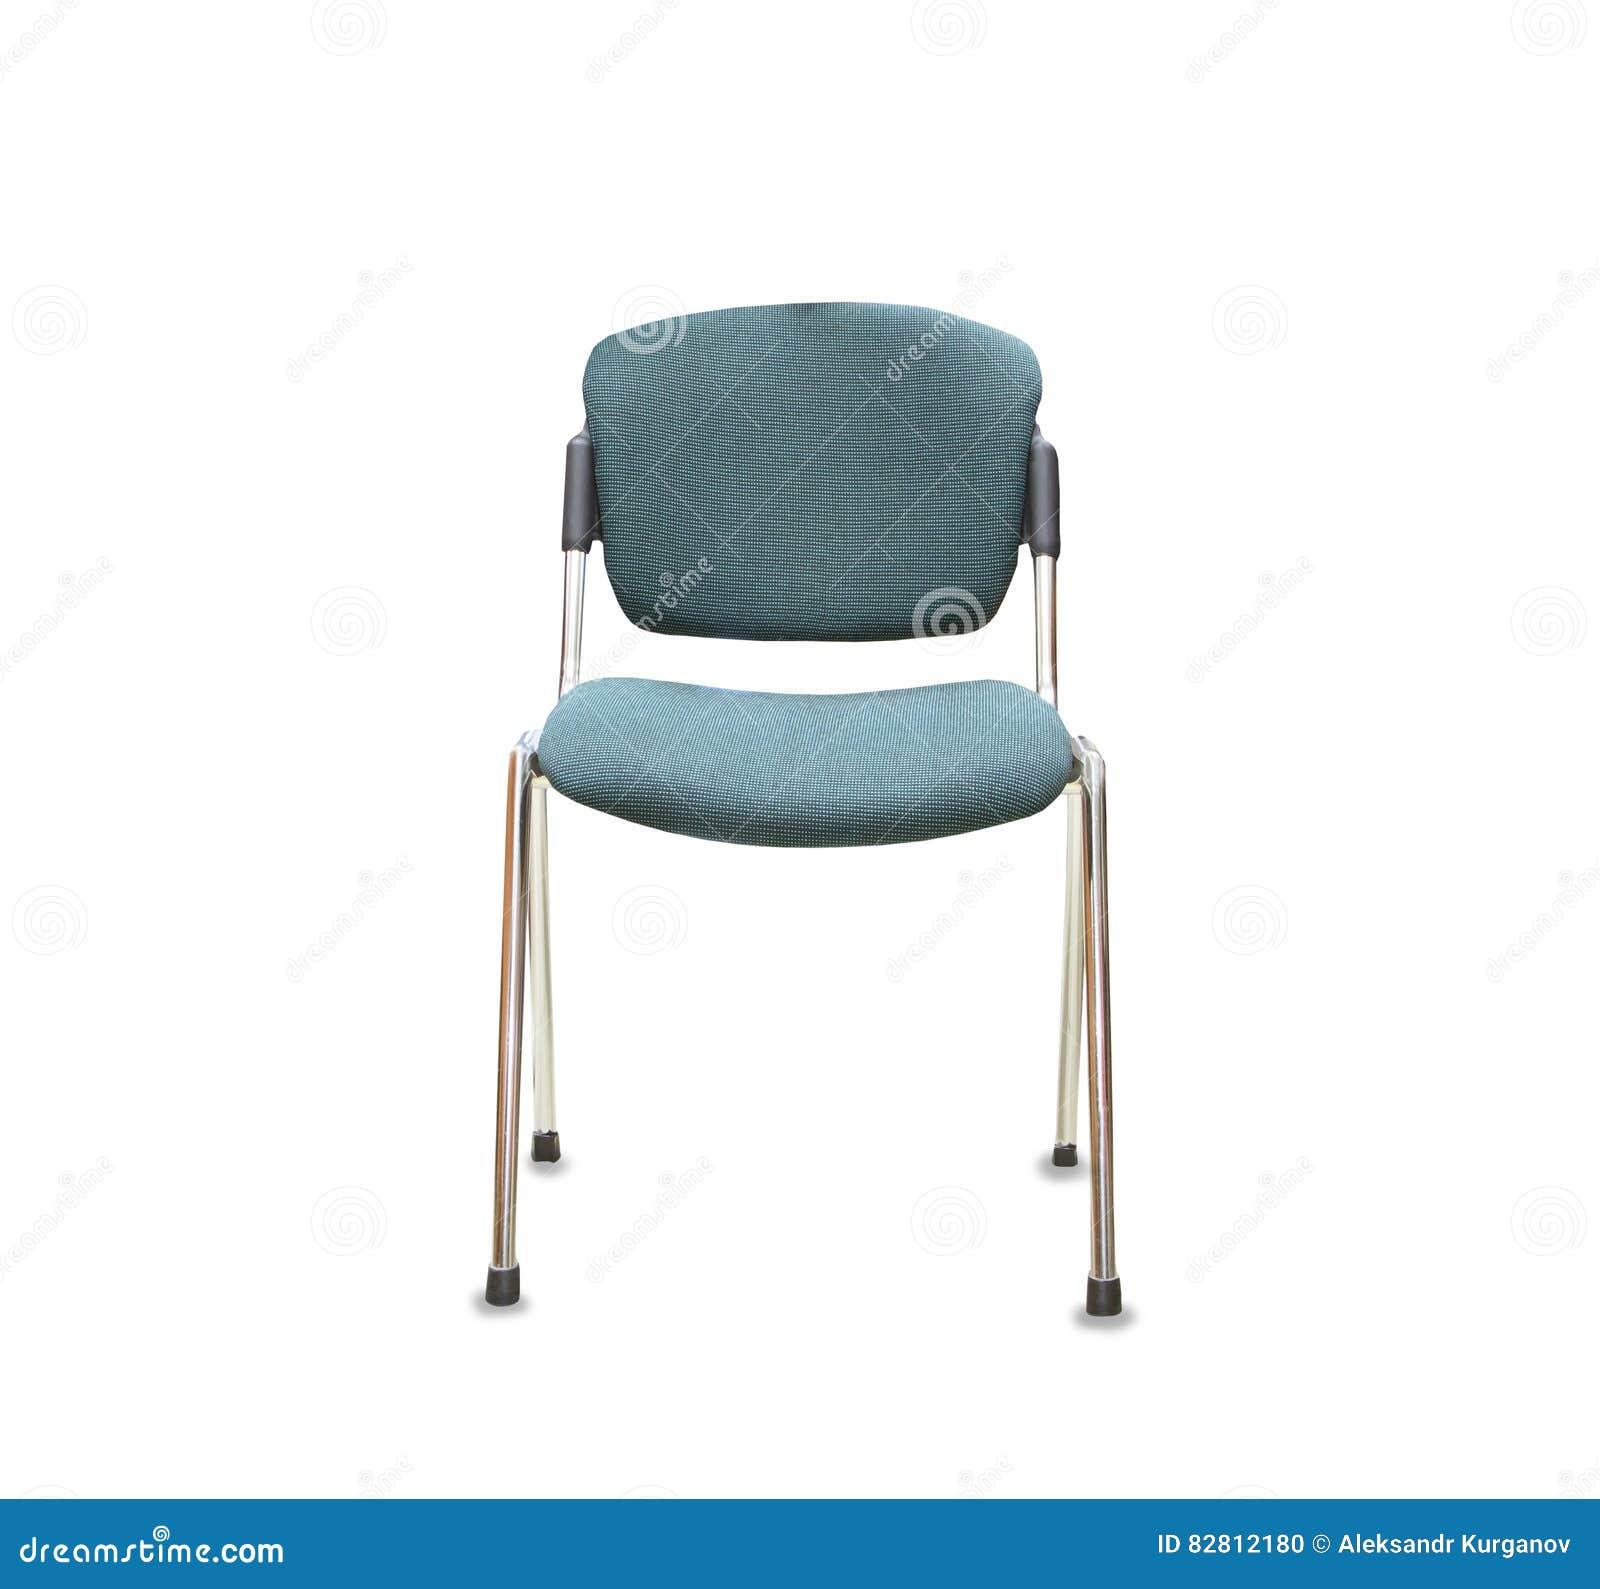 Bürostuhl weiß stoff  Bürostuhl Vom Grünen Stoff über Weiß Stockfoto - Bild: 82812180